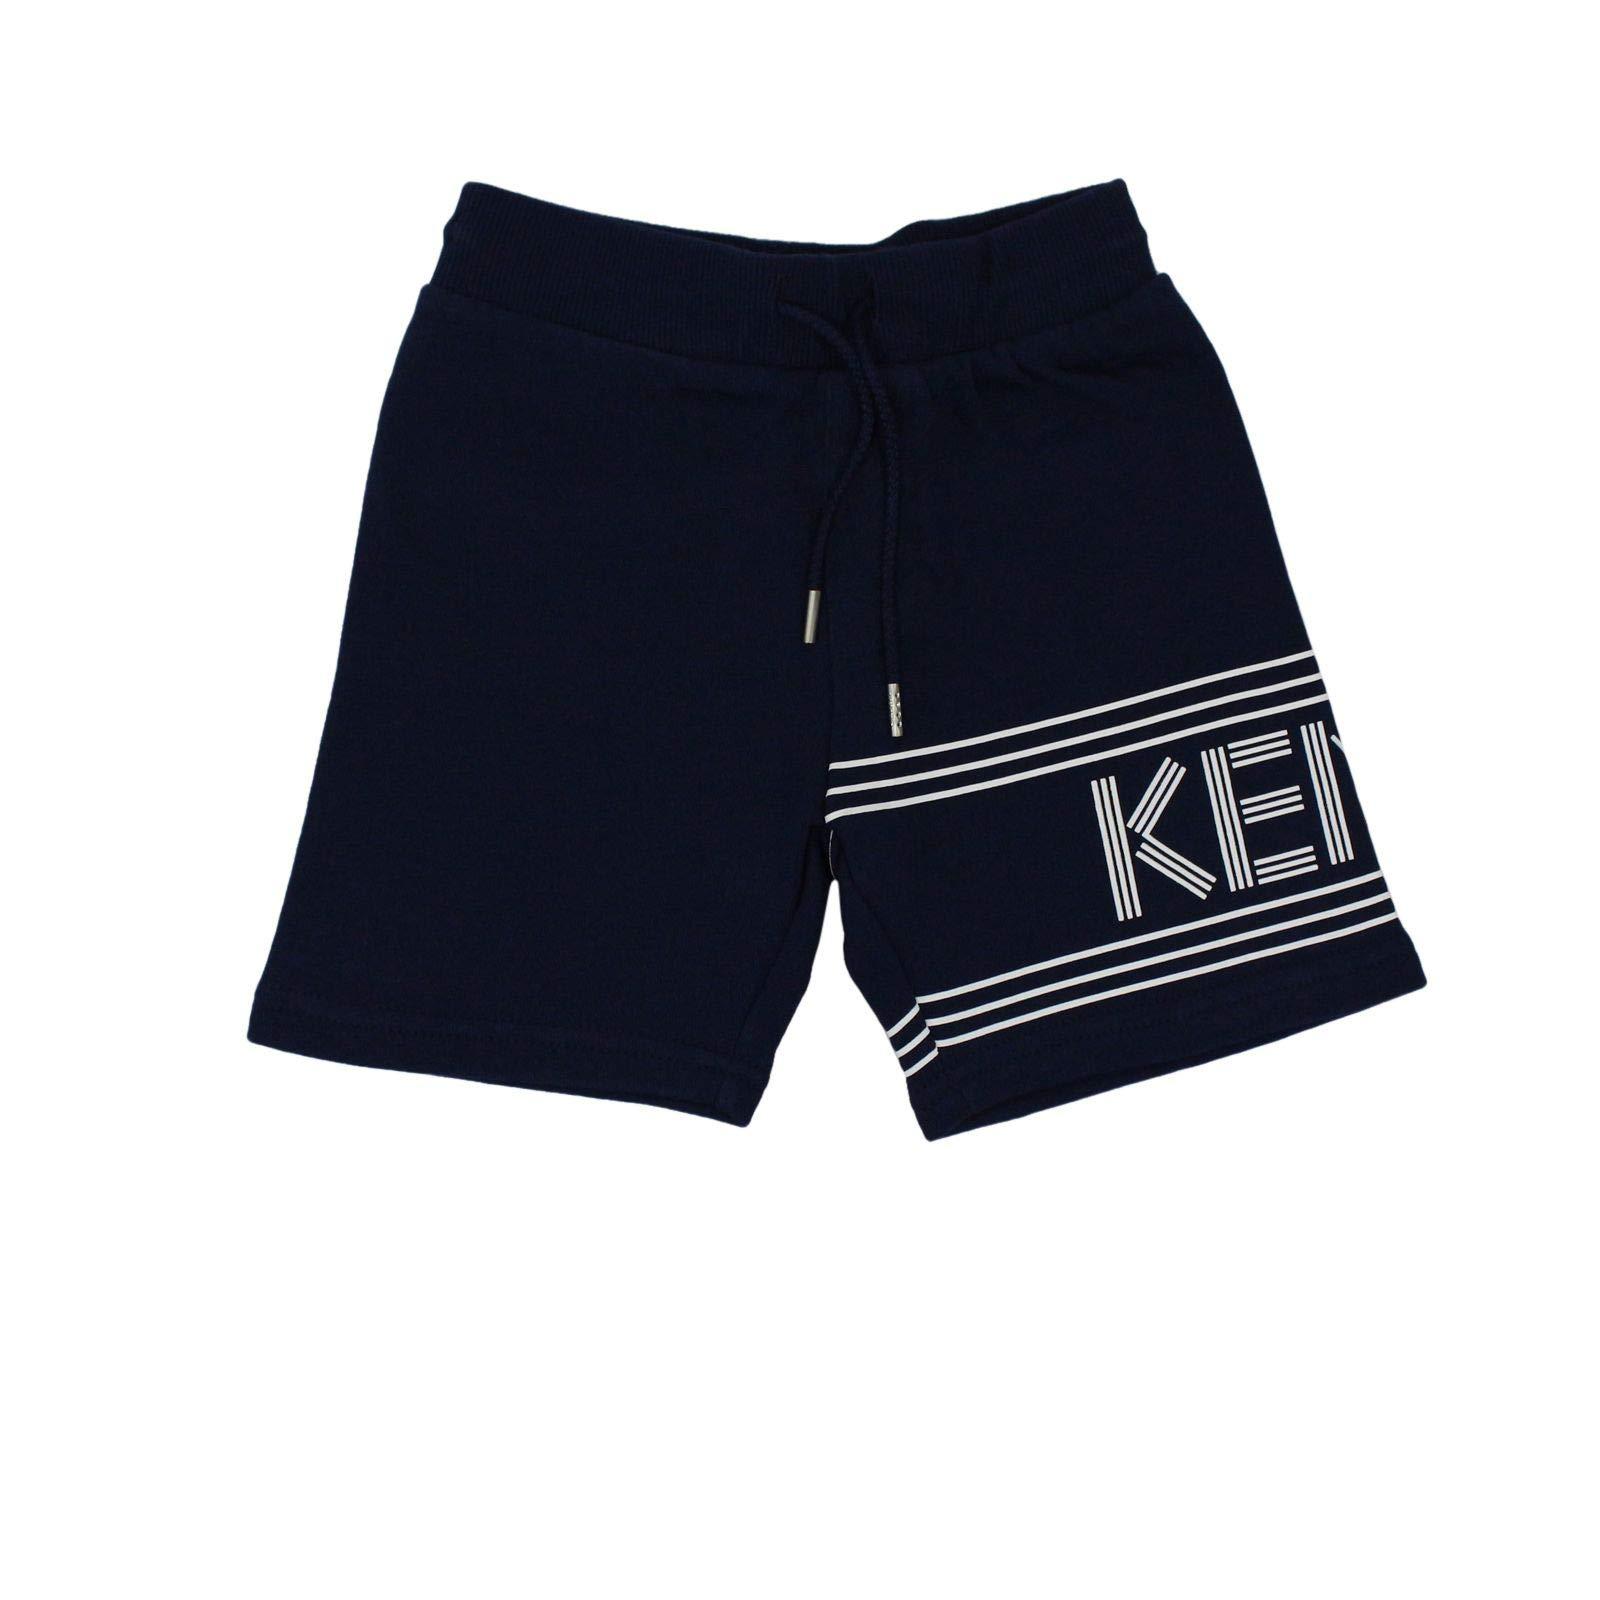 Kenzo Boys Kn2560849 Blue Cotton Shorts